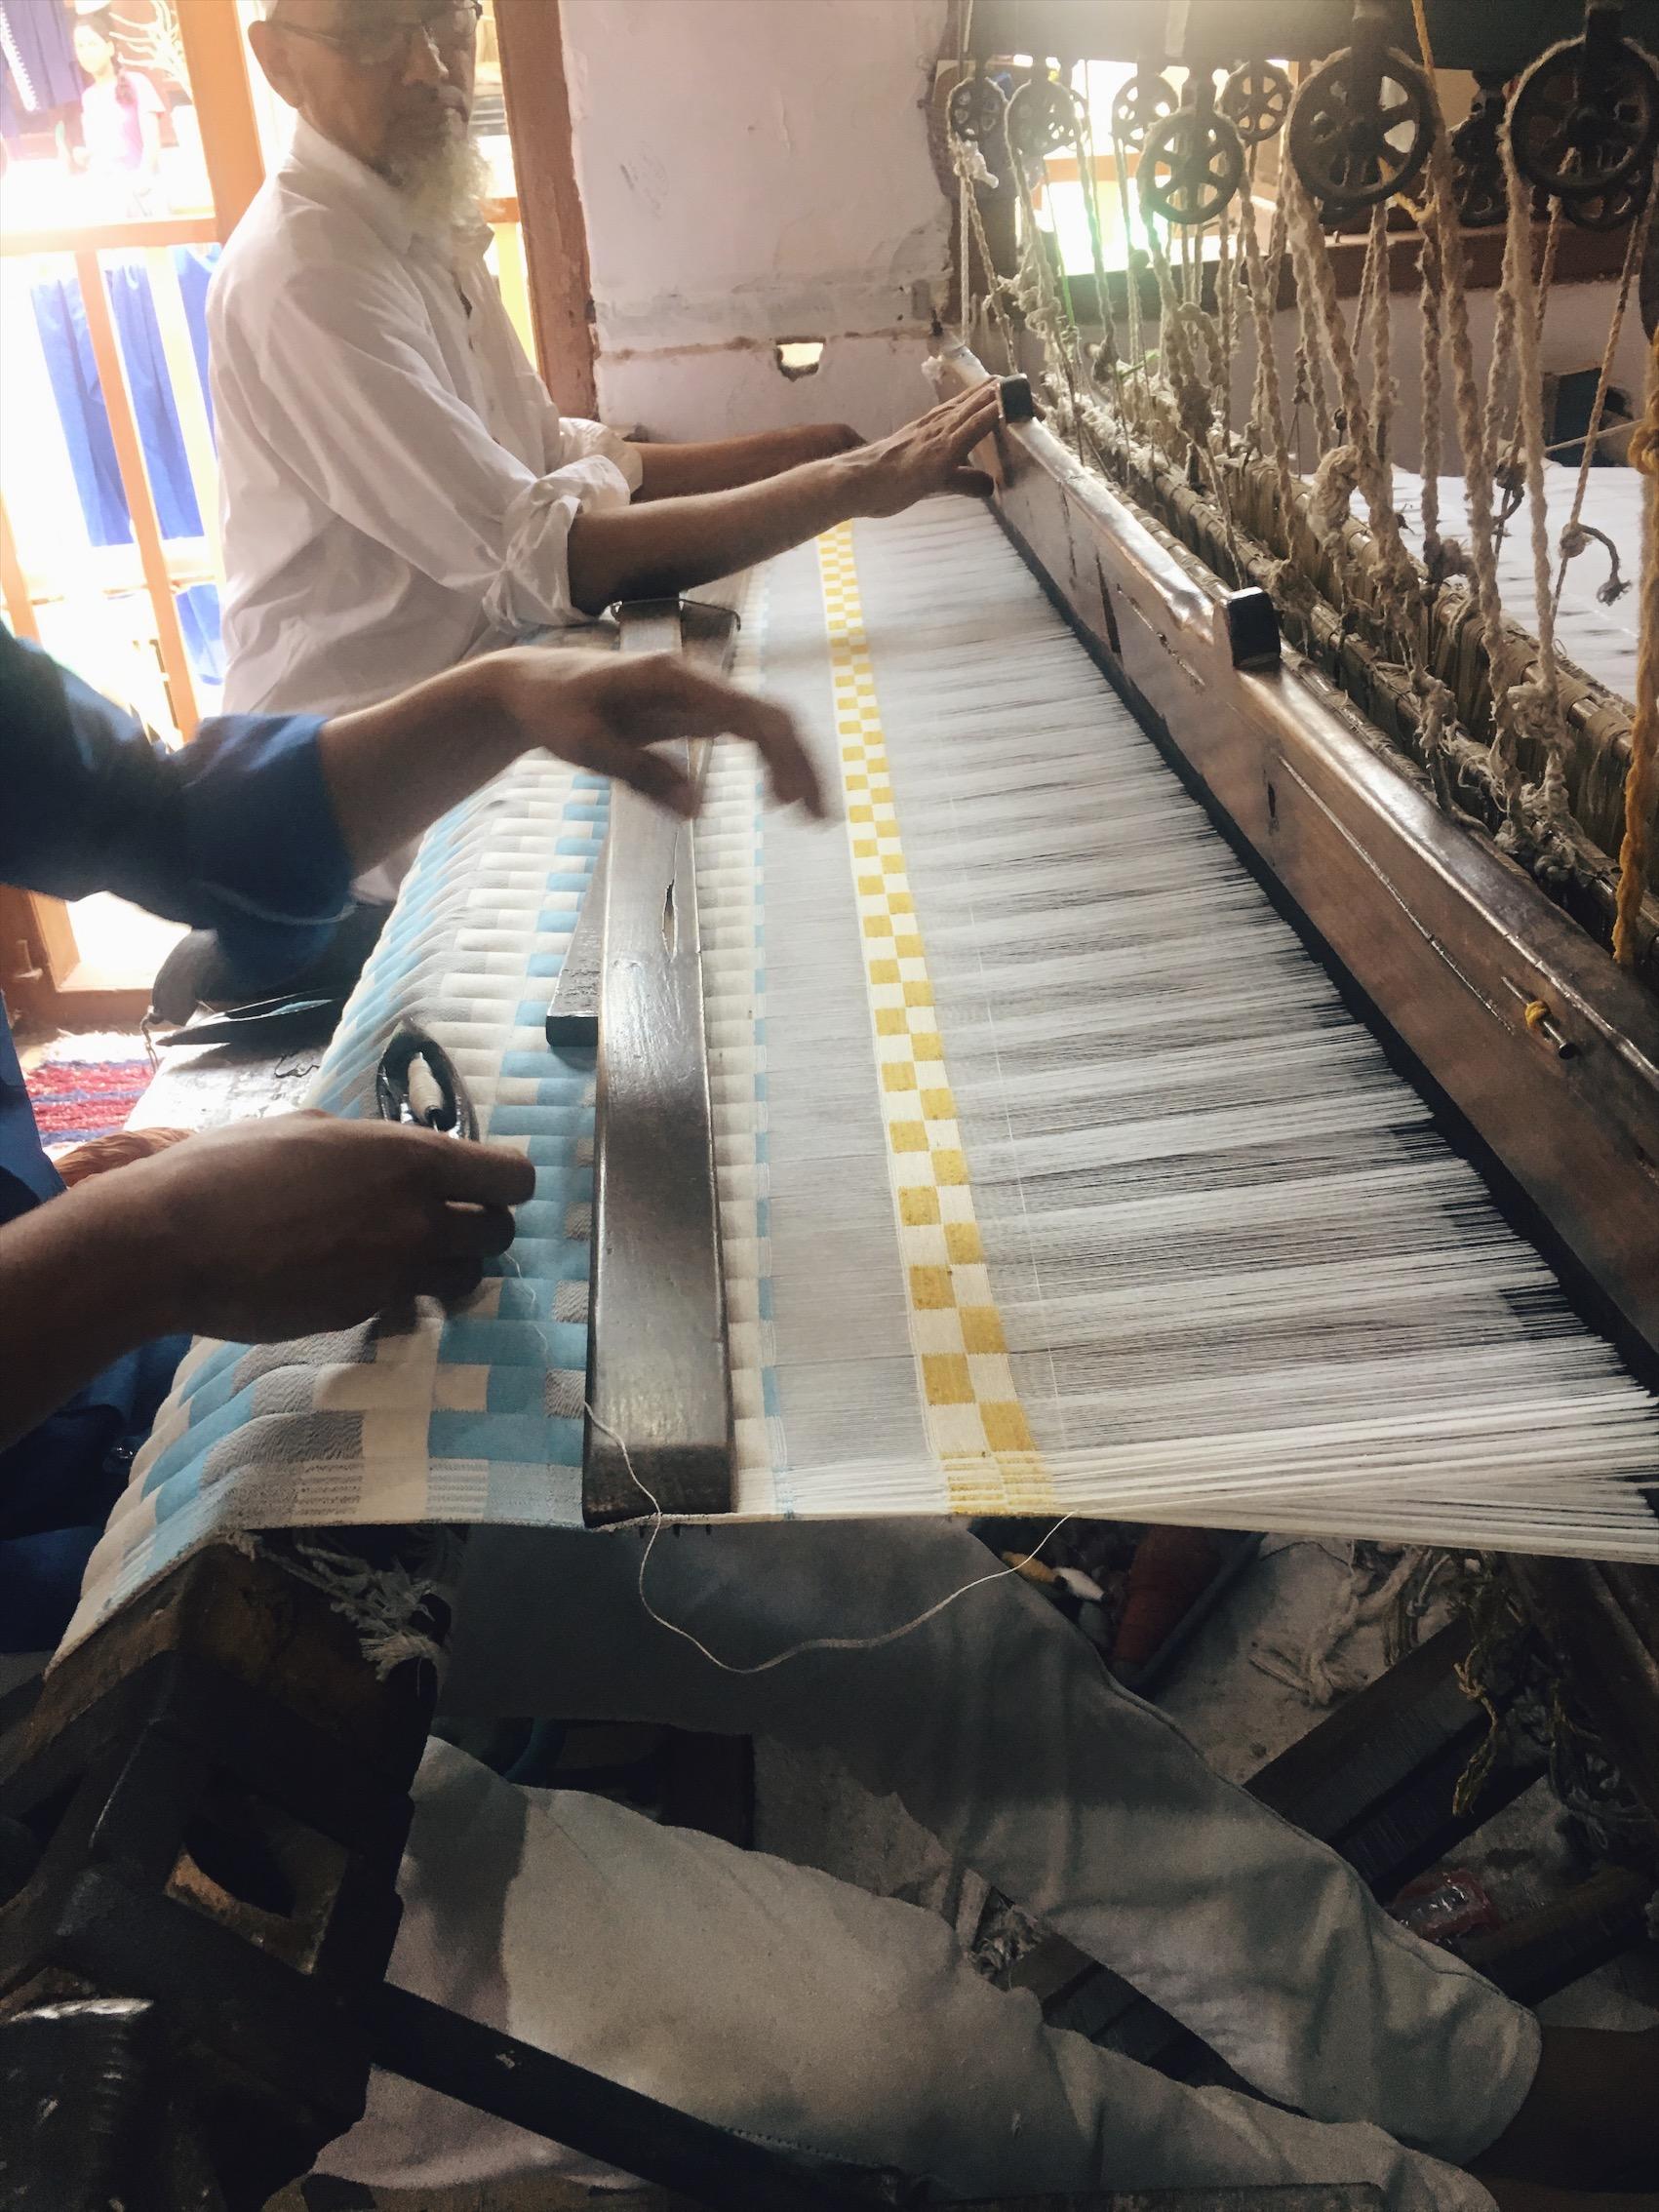 Sujni craft in the making